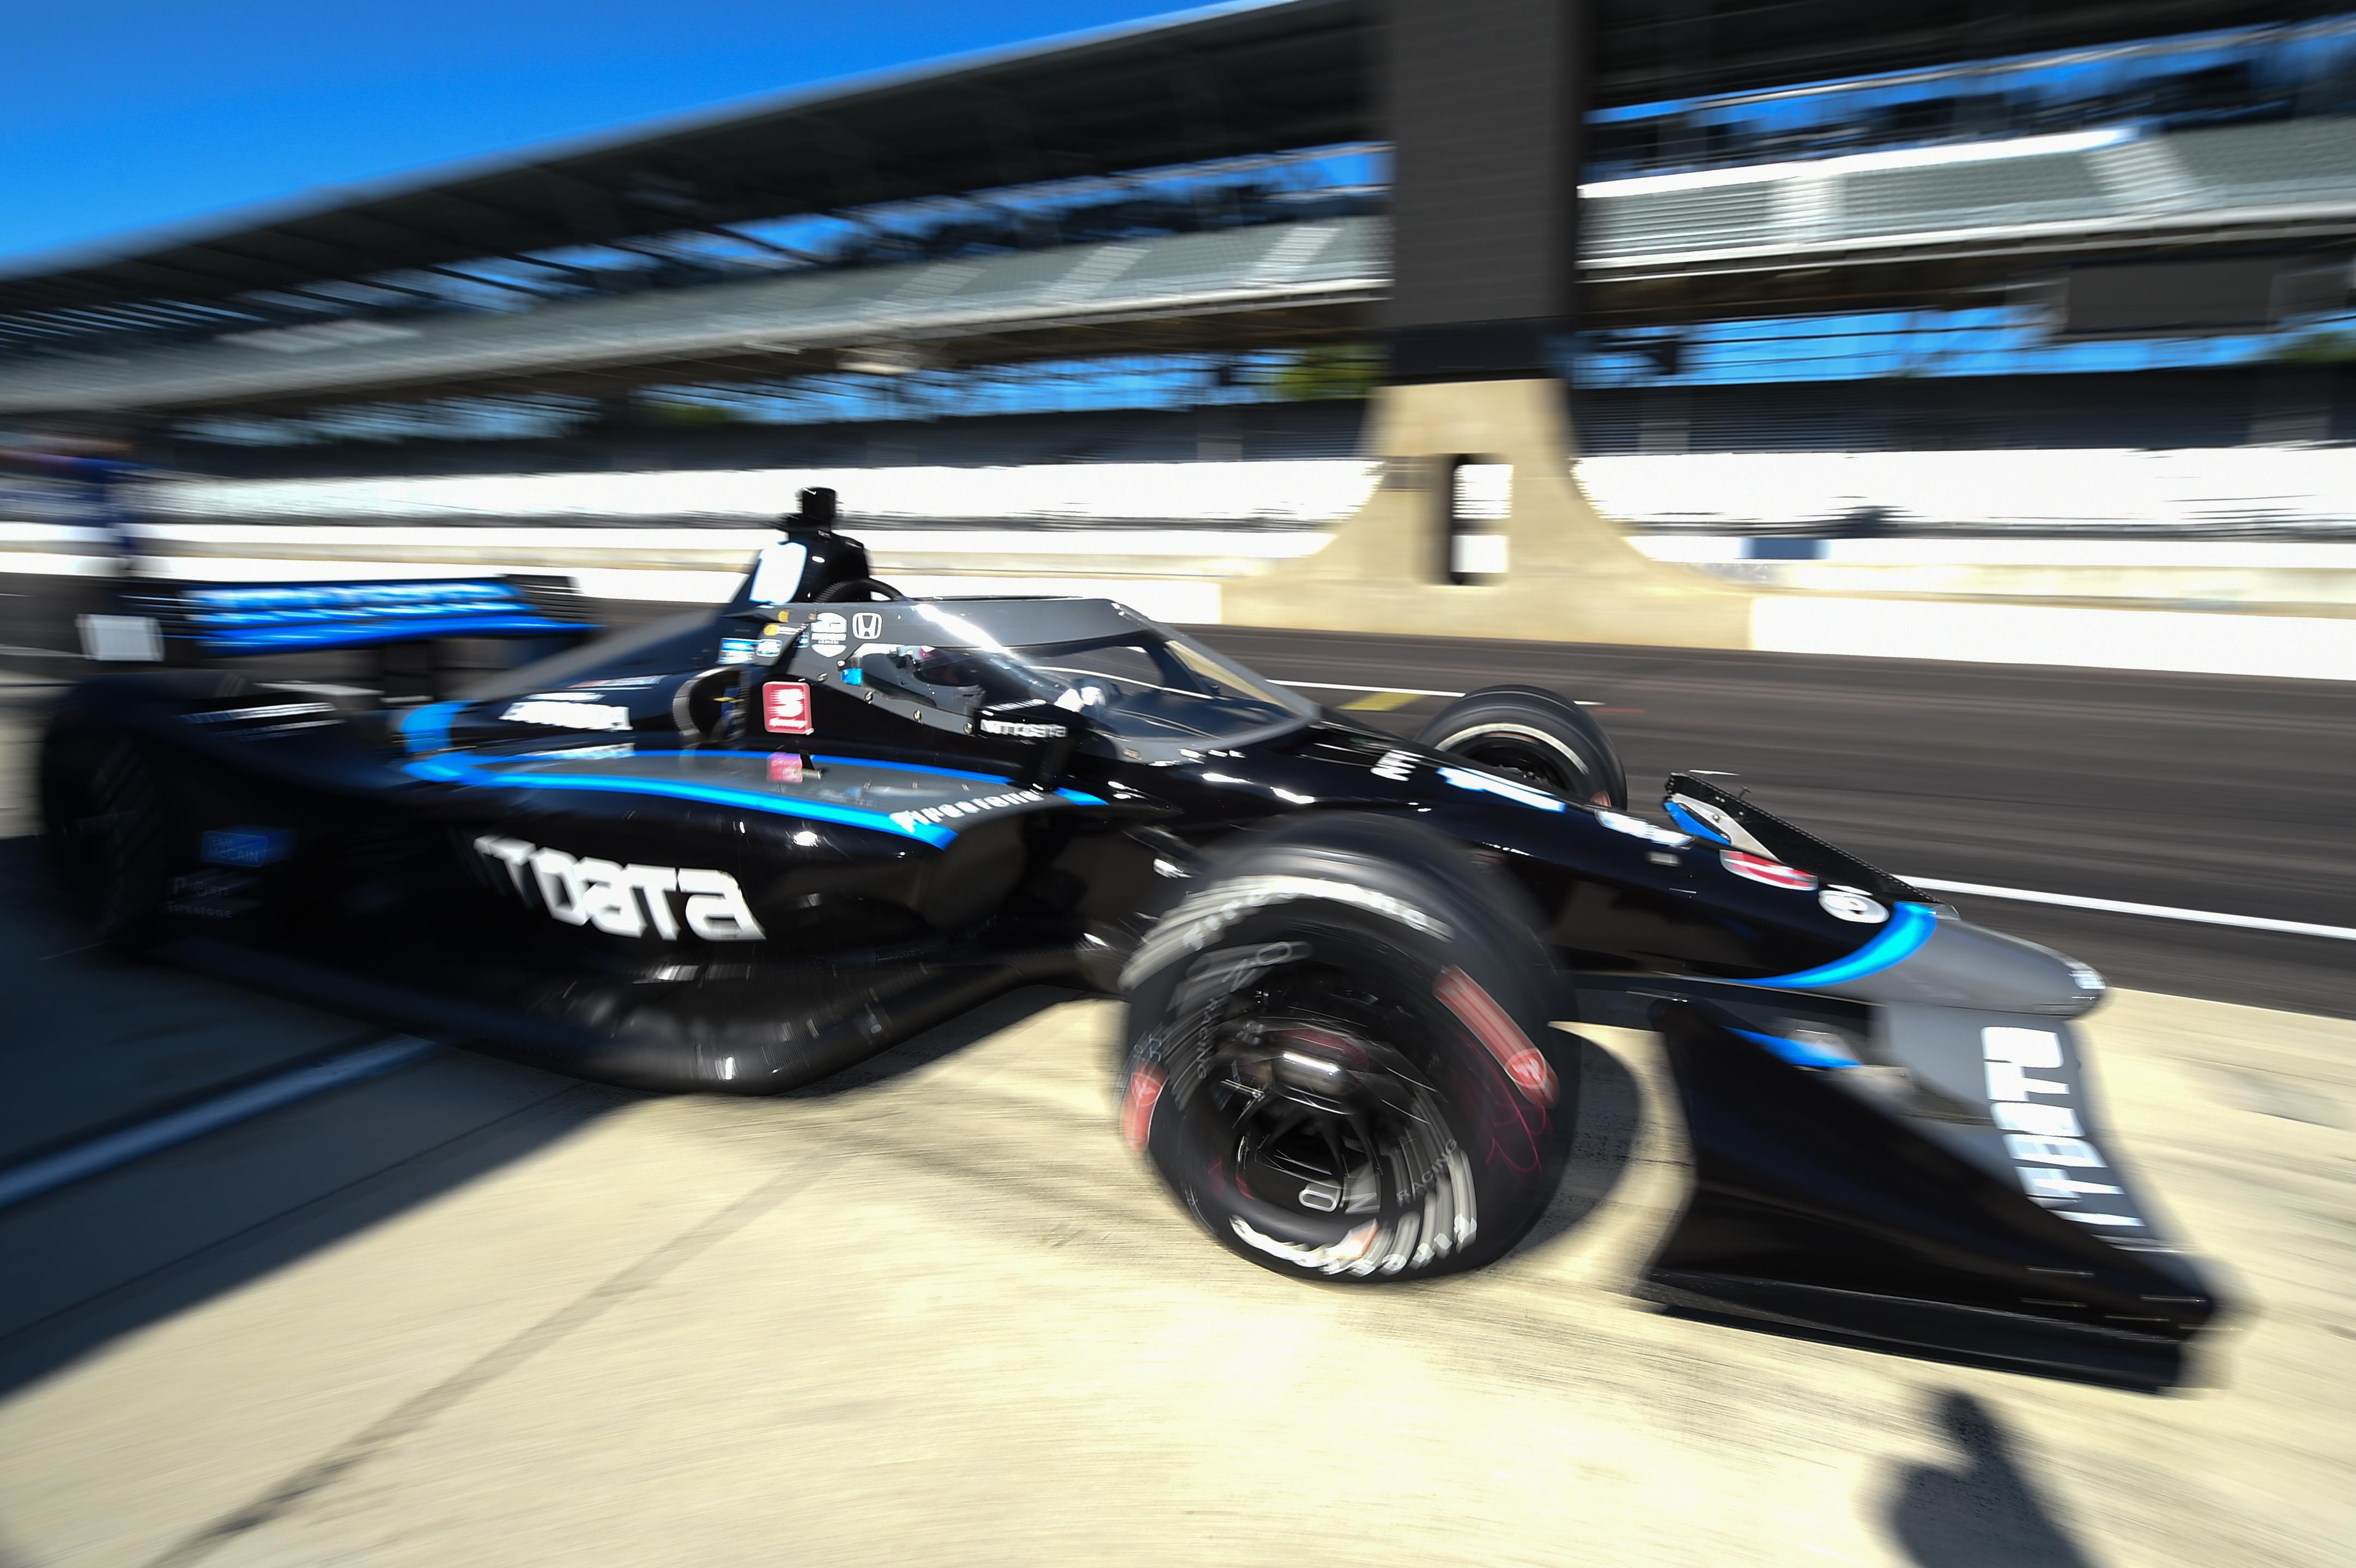 Jimmie Johnson Ganassi IndyCar test